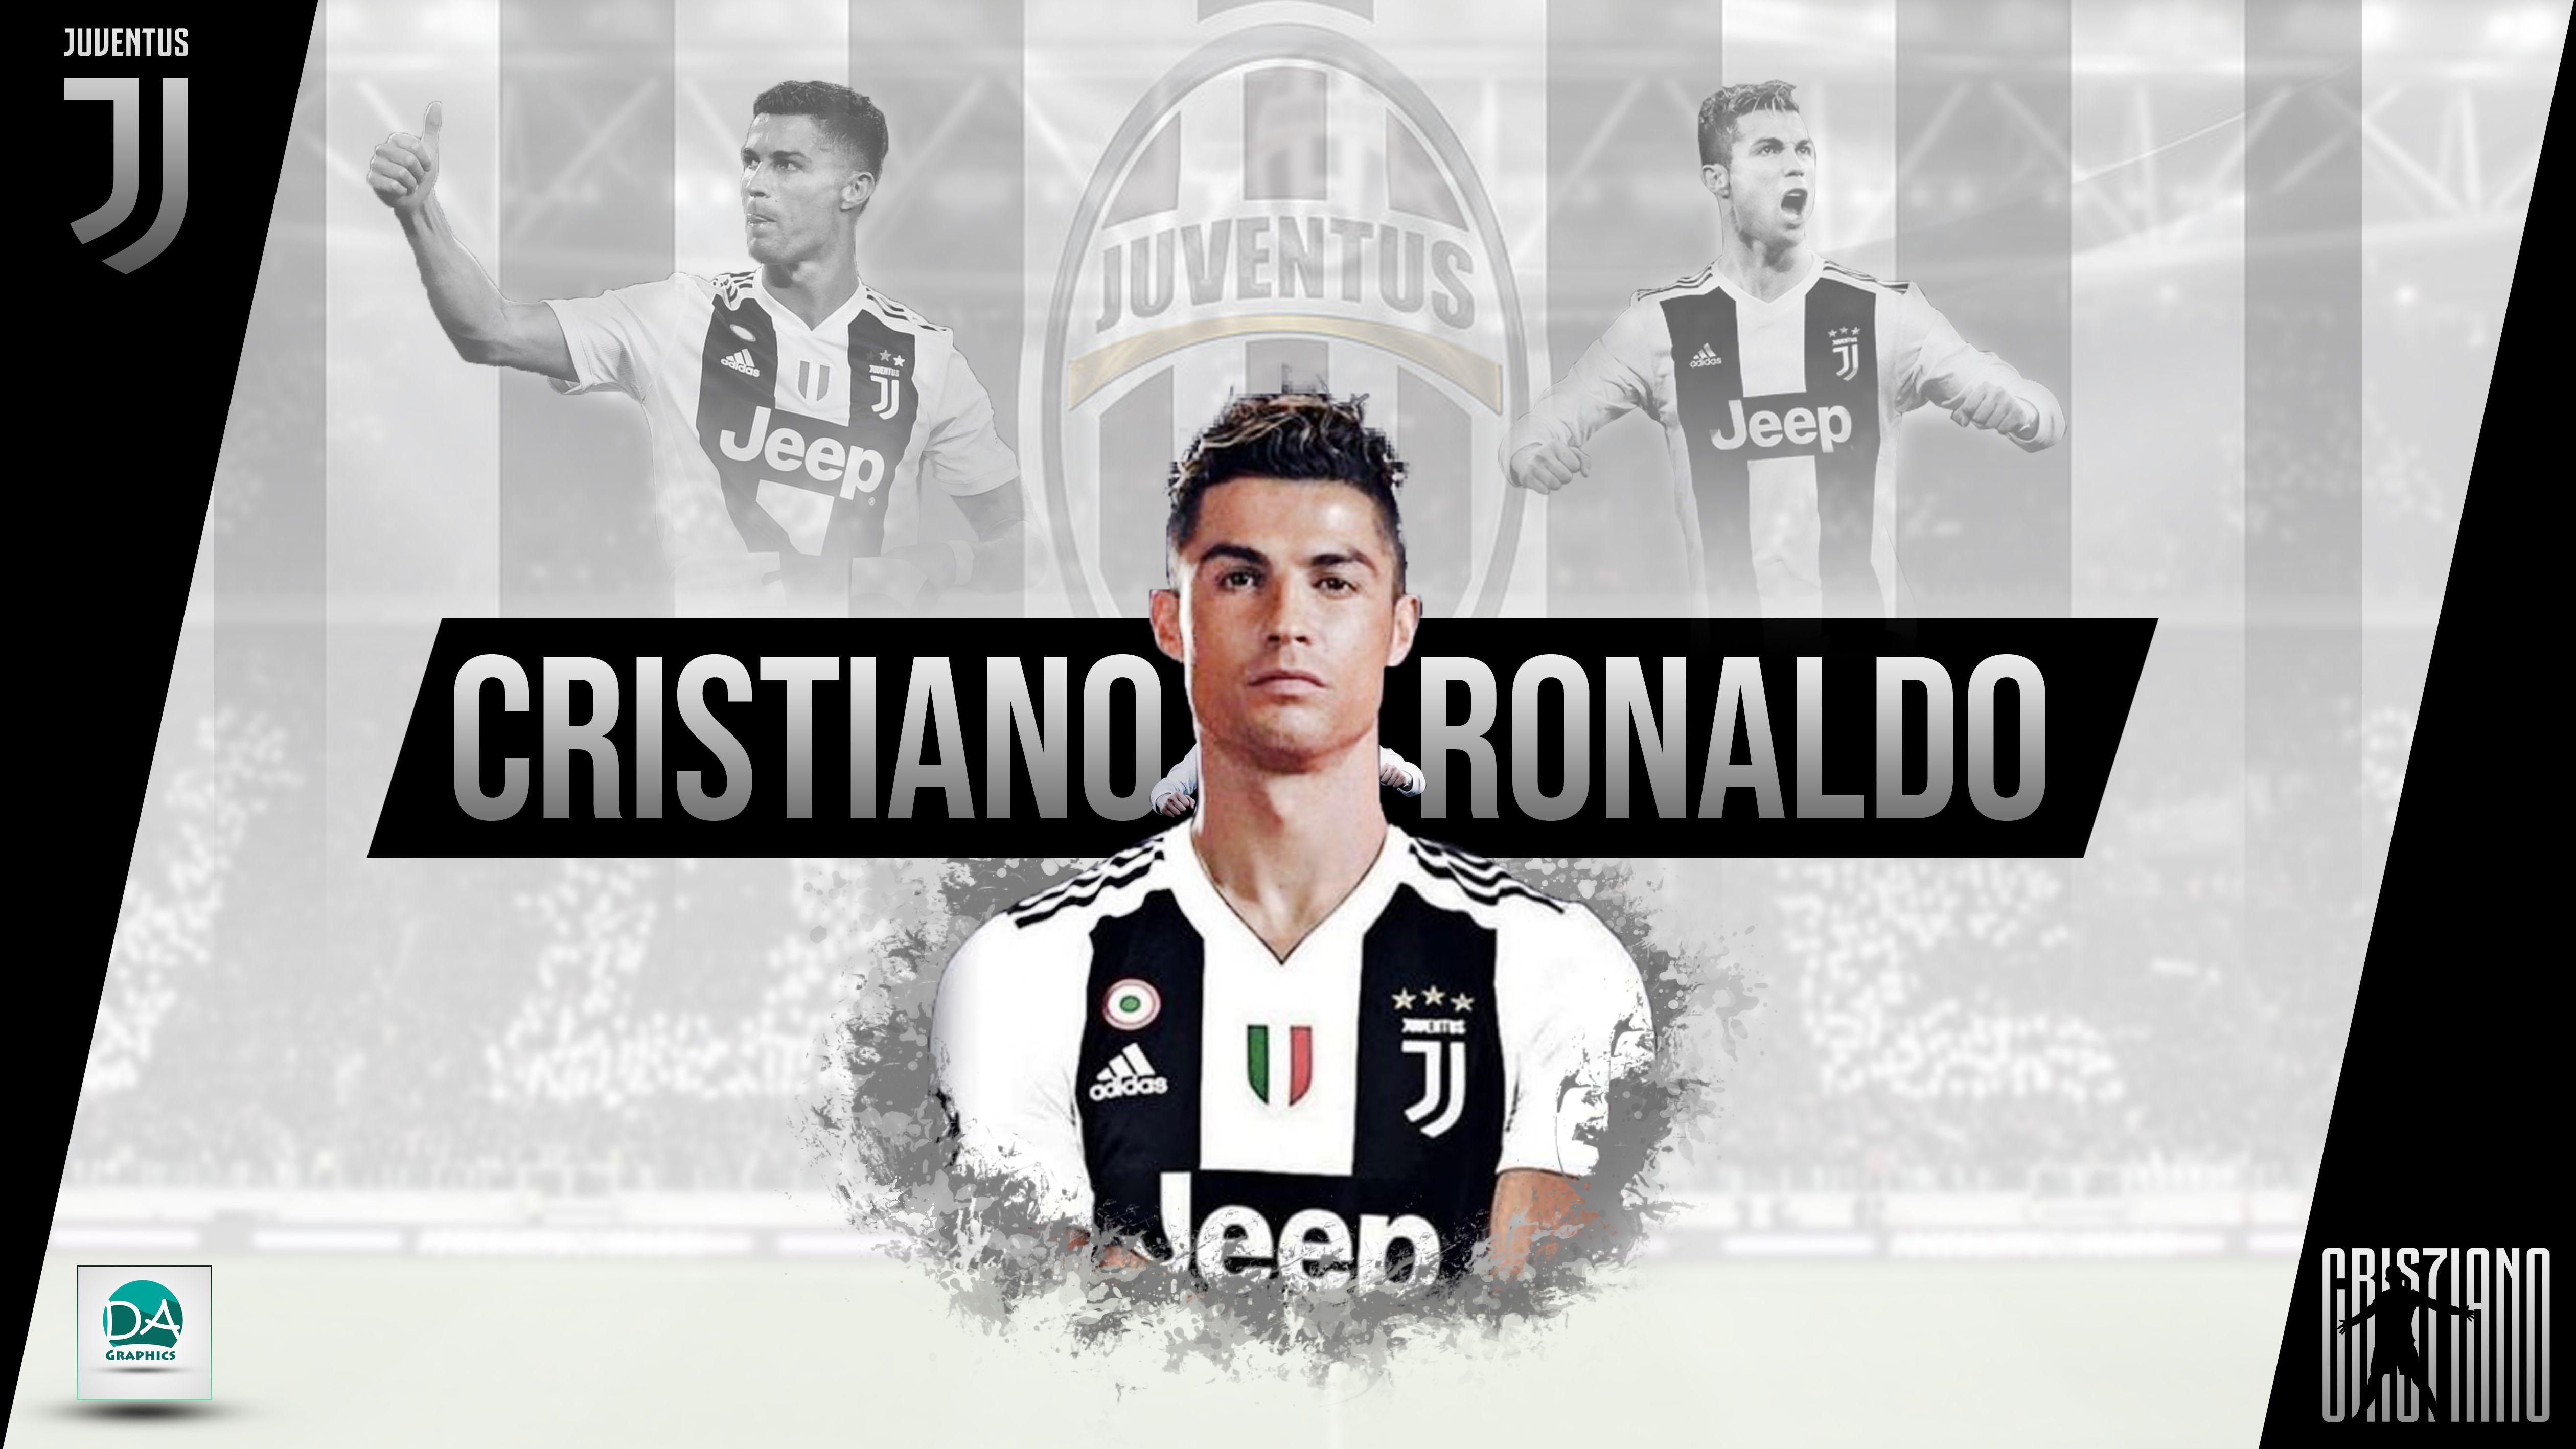 Cristiano Ronaldo Juventus Wallpaper Cristiano Ronaldo Juventus 5040x2835